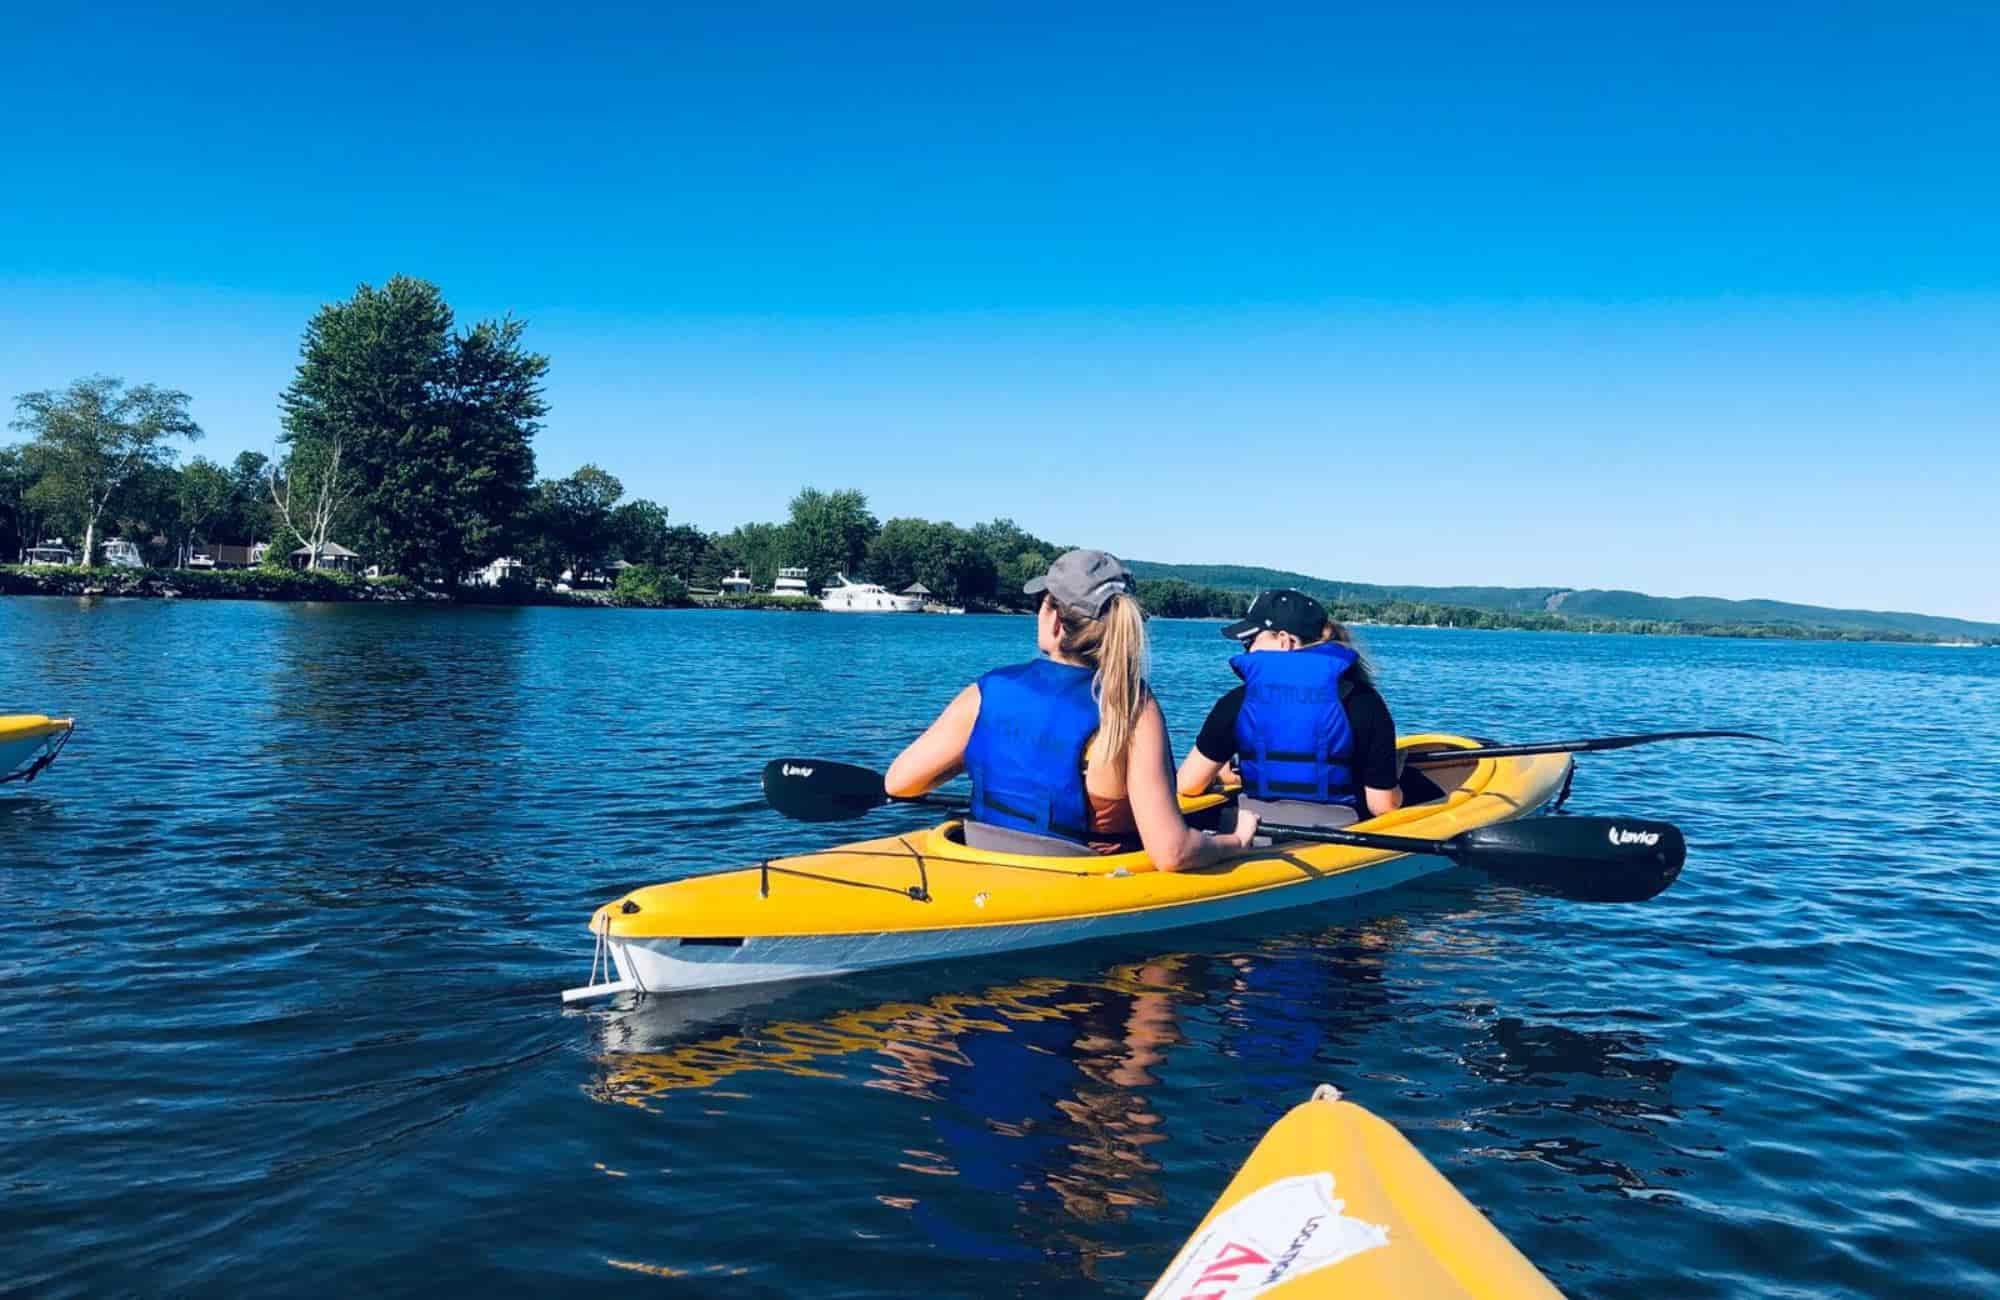 Voyage Québec - Balade en Kayak - Amplitudes